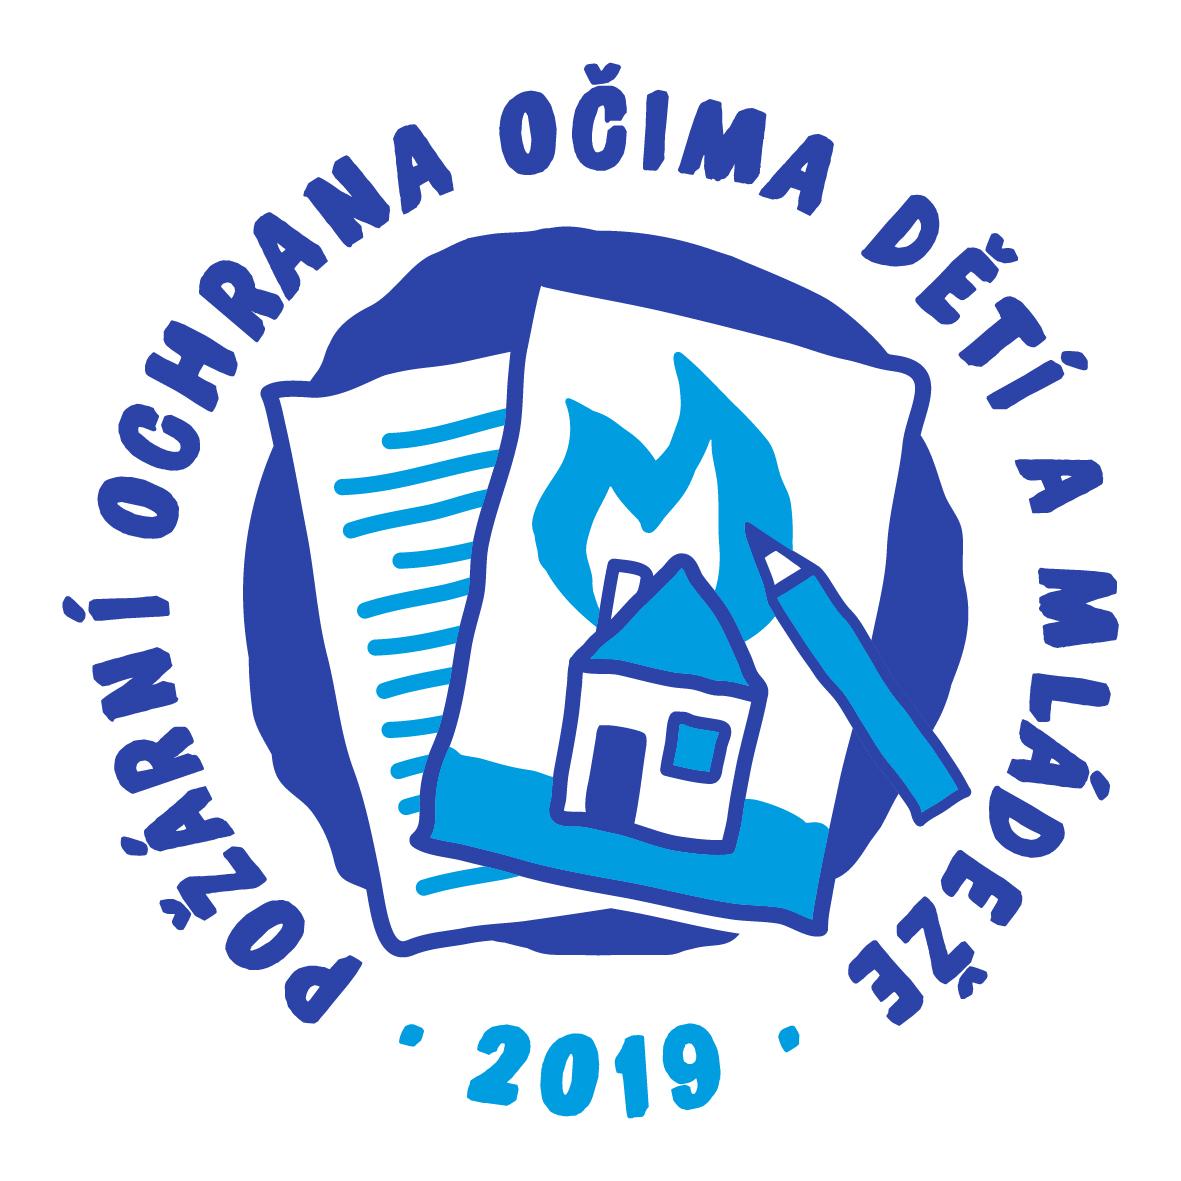 logo pood 2019 barva